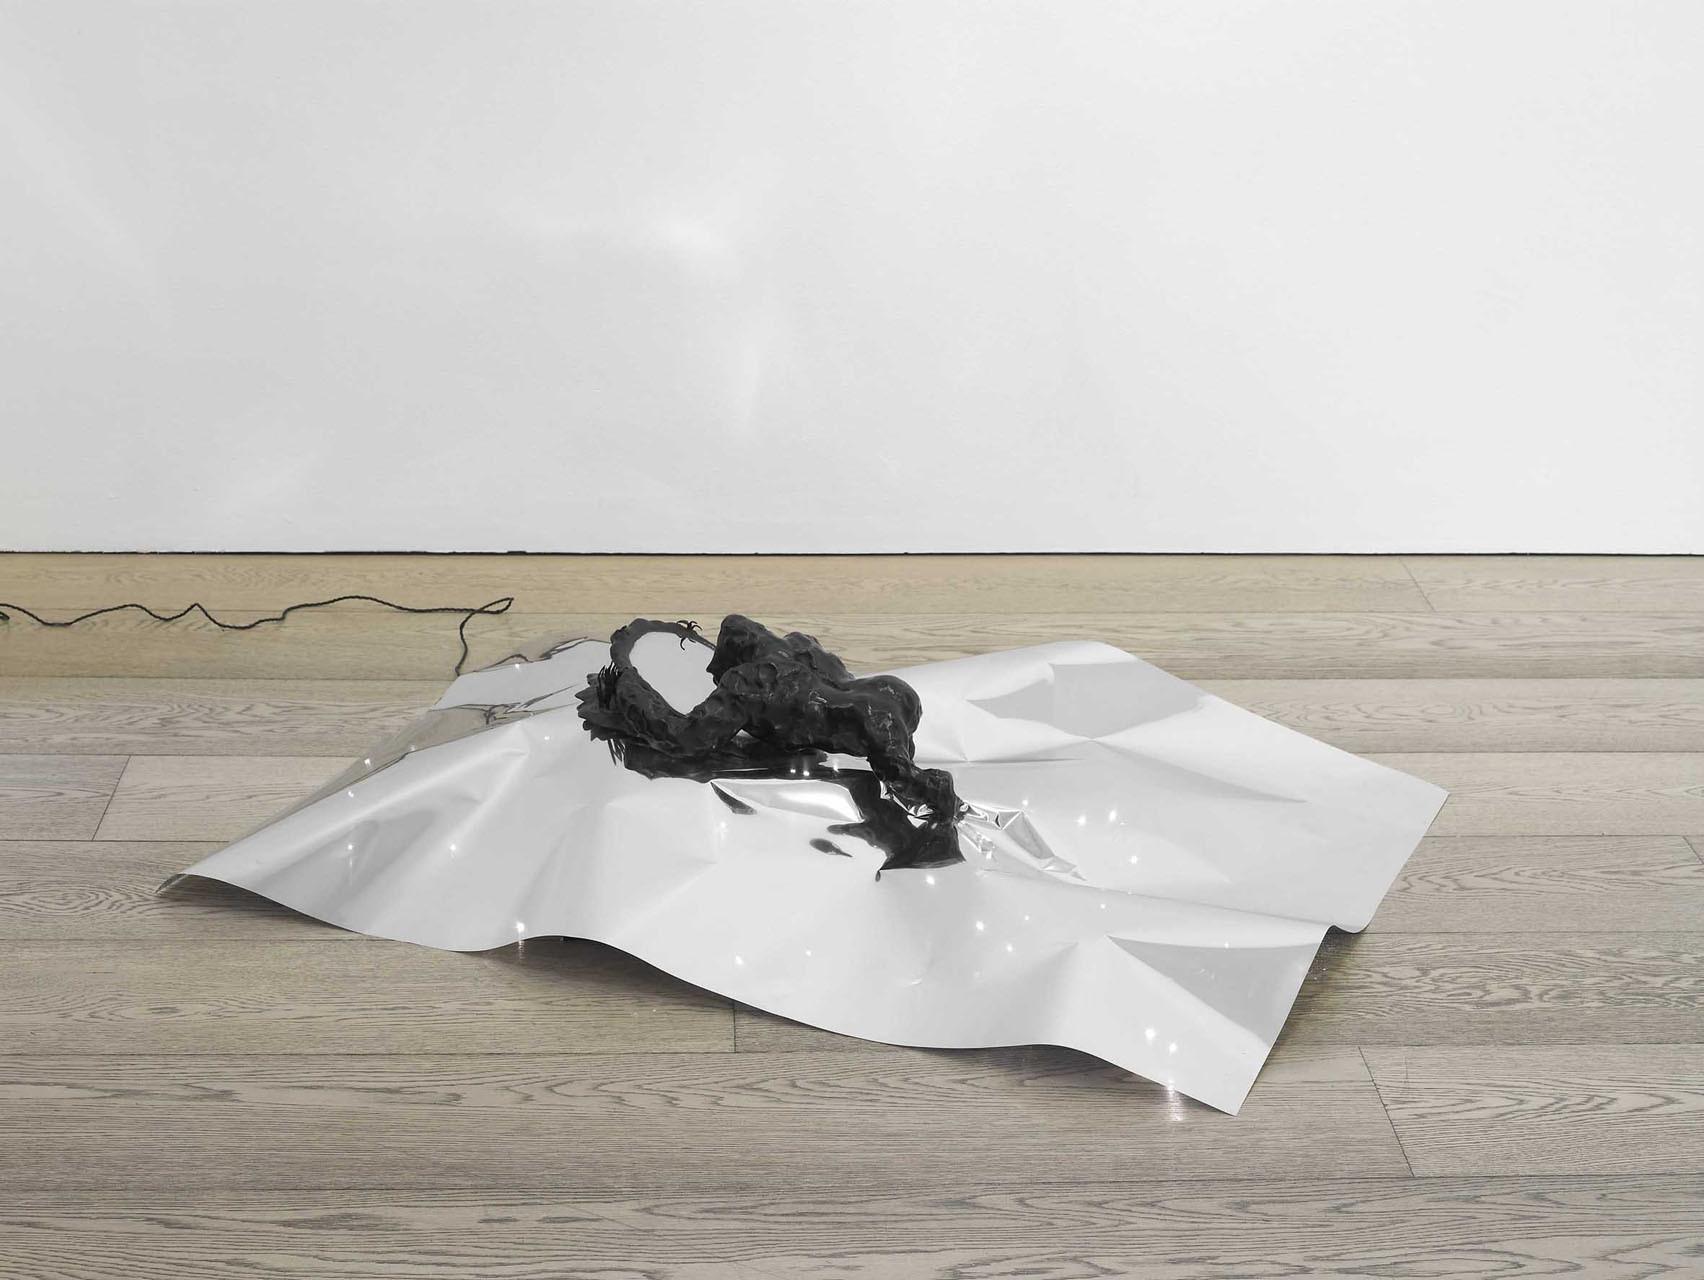 "<div class=""artwork_caption""><p>The Birth of Consistency, 2004</p></div>"